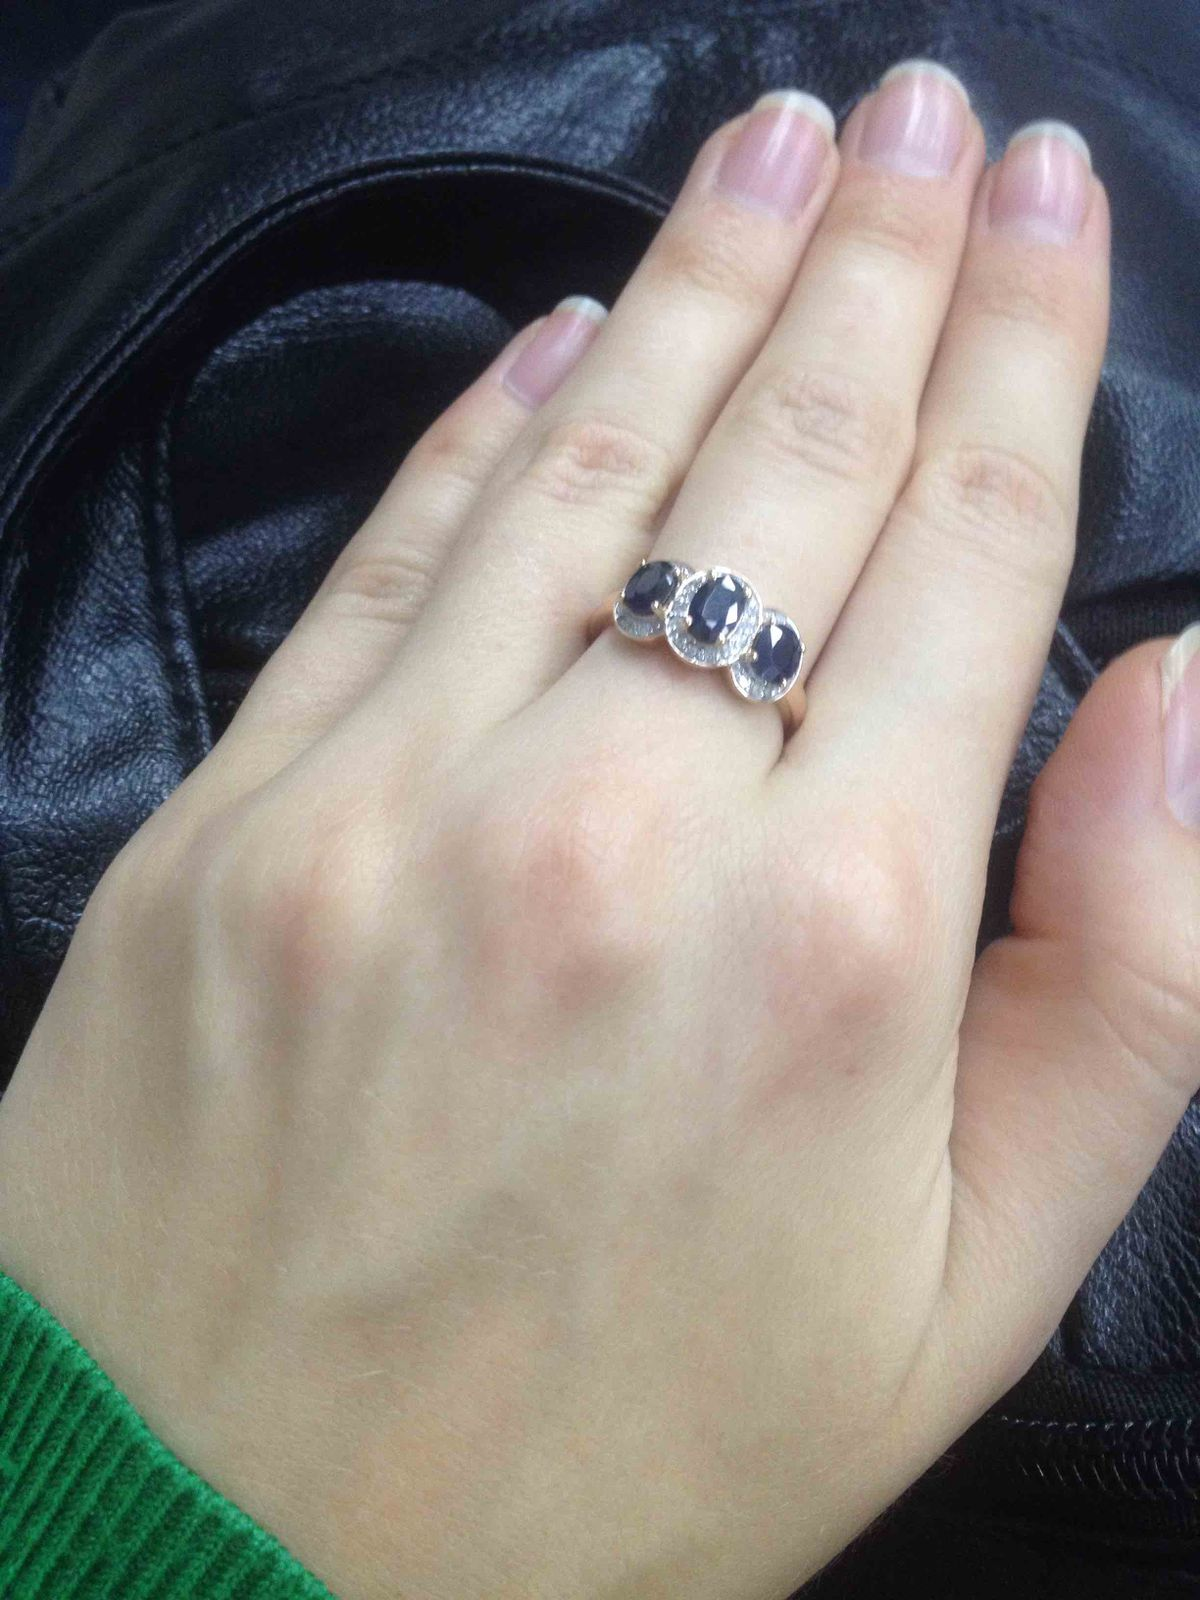 Кольцо с сапфирами:)))